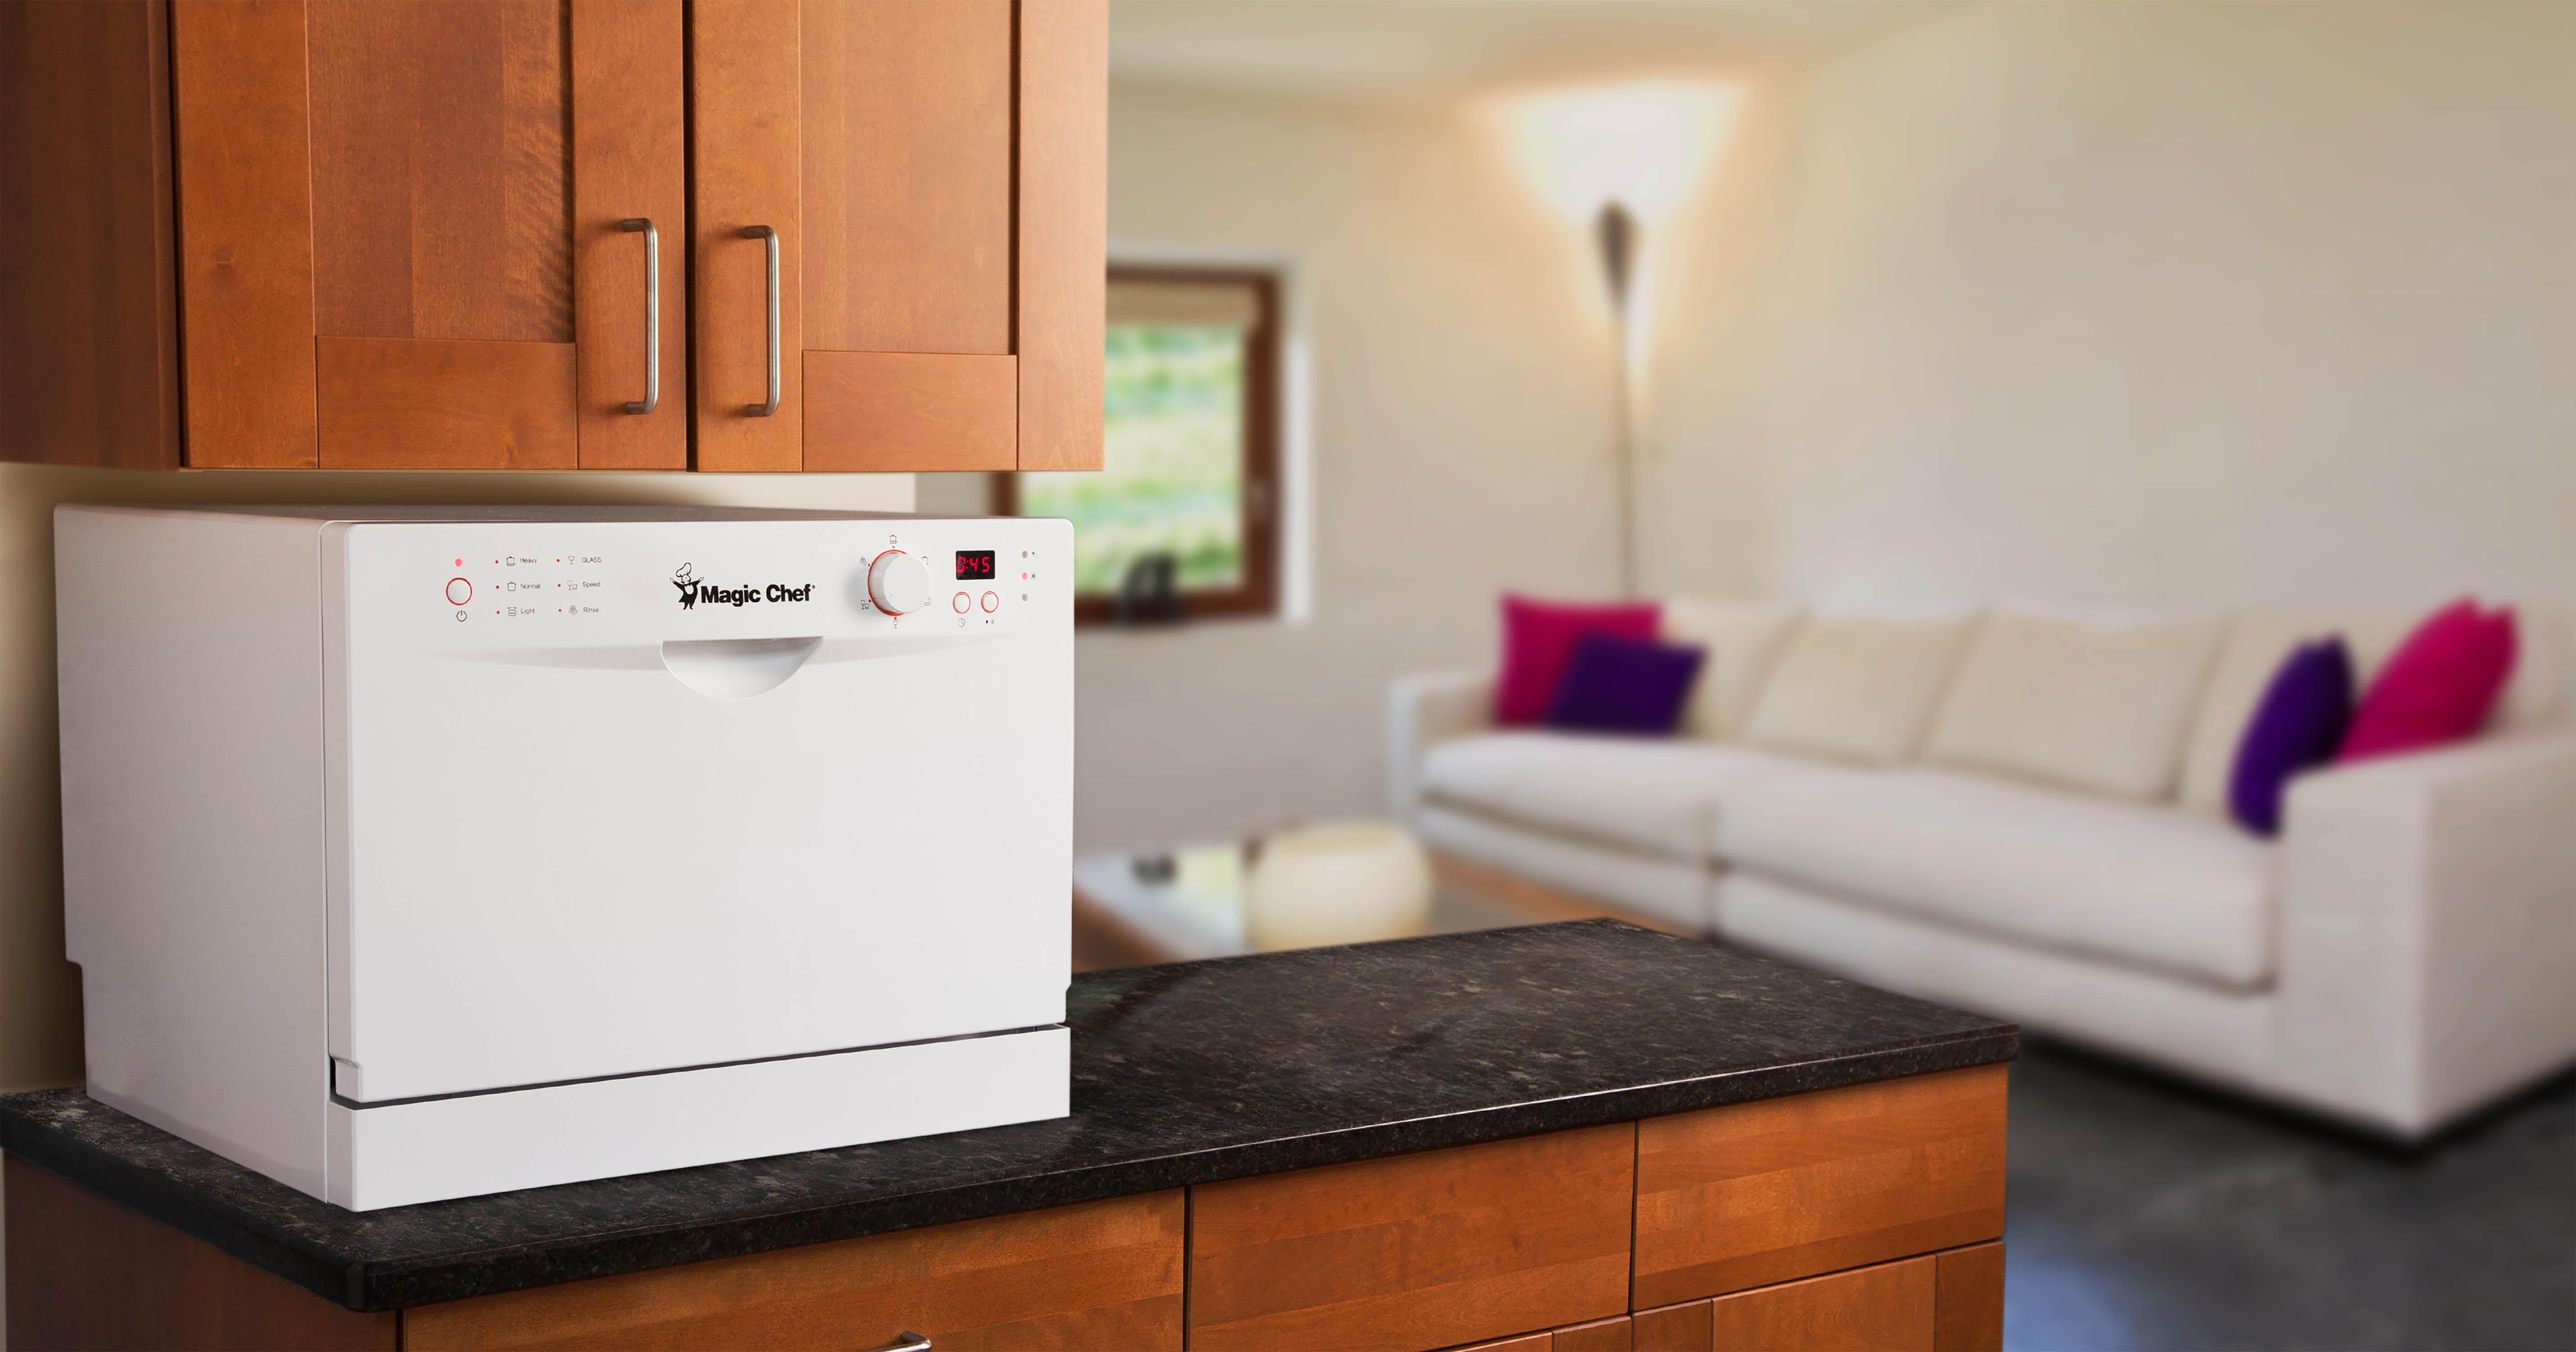 10 Best Countertop Dishwasher Reviews 2018 Countertop Dishwasher